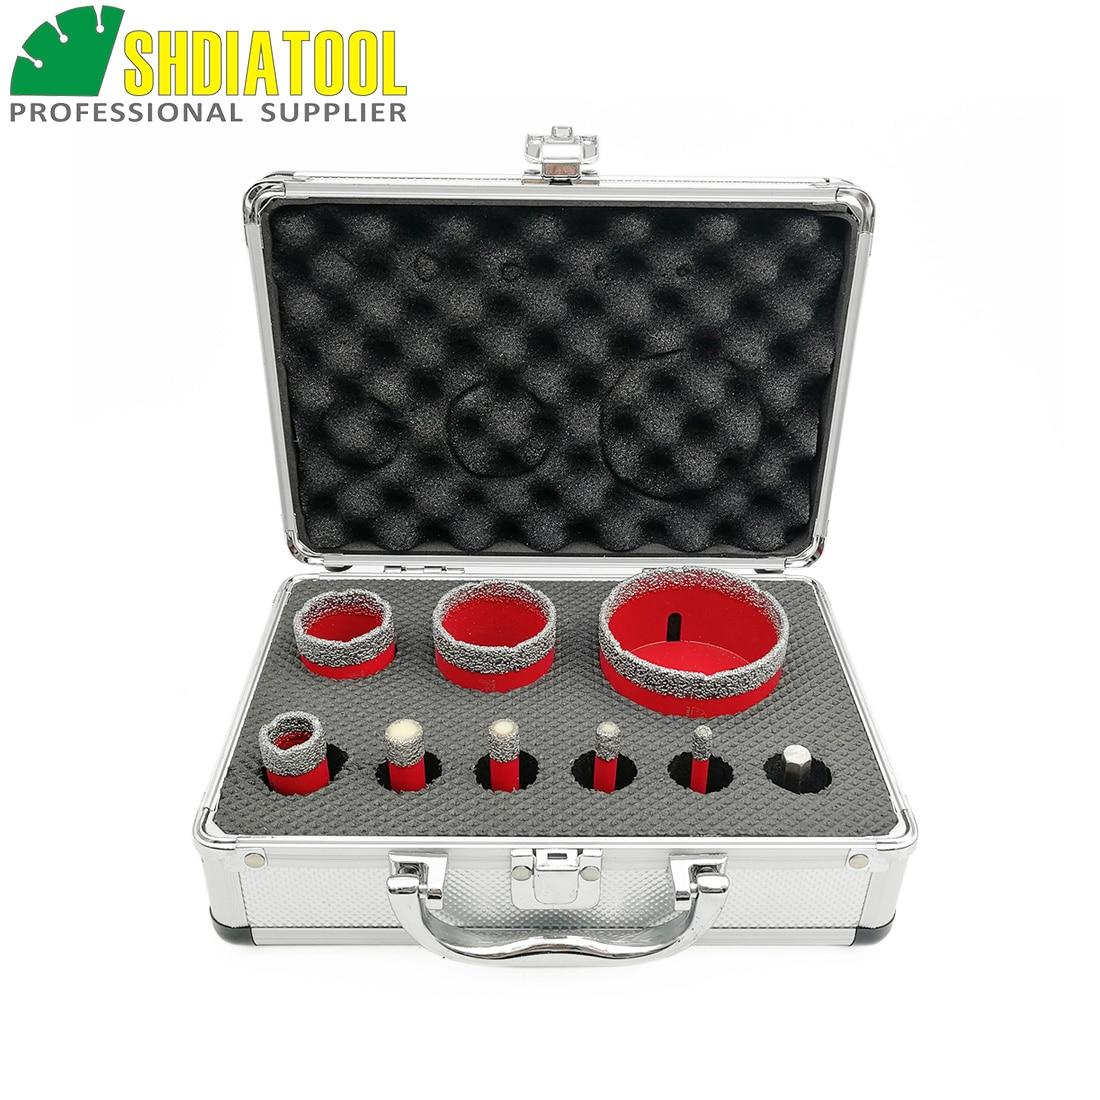 SHDIATOOL 1set/9pcs M14 Vacuum Brazed Diamond Drill Core Bits With Box Granite Marble Ceramic Hole Saw Drilling Bit& Hex Adapter